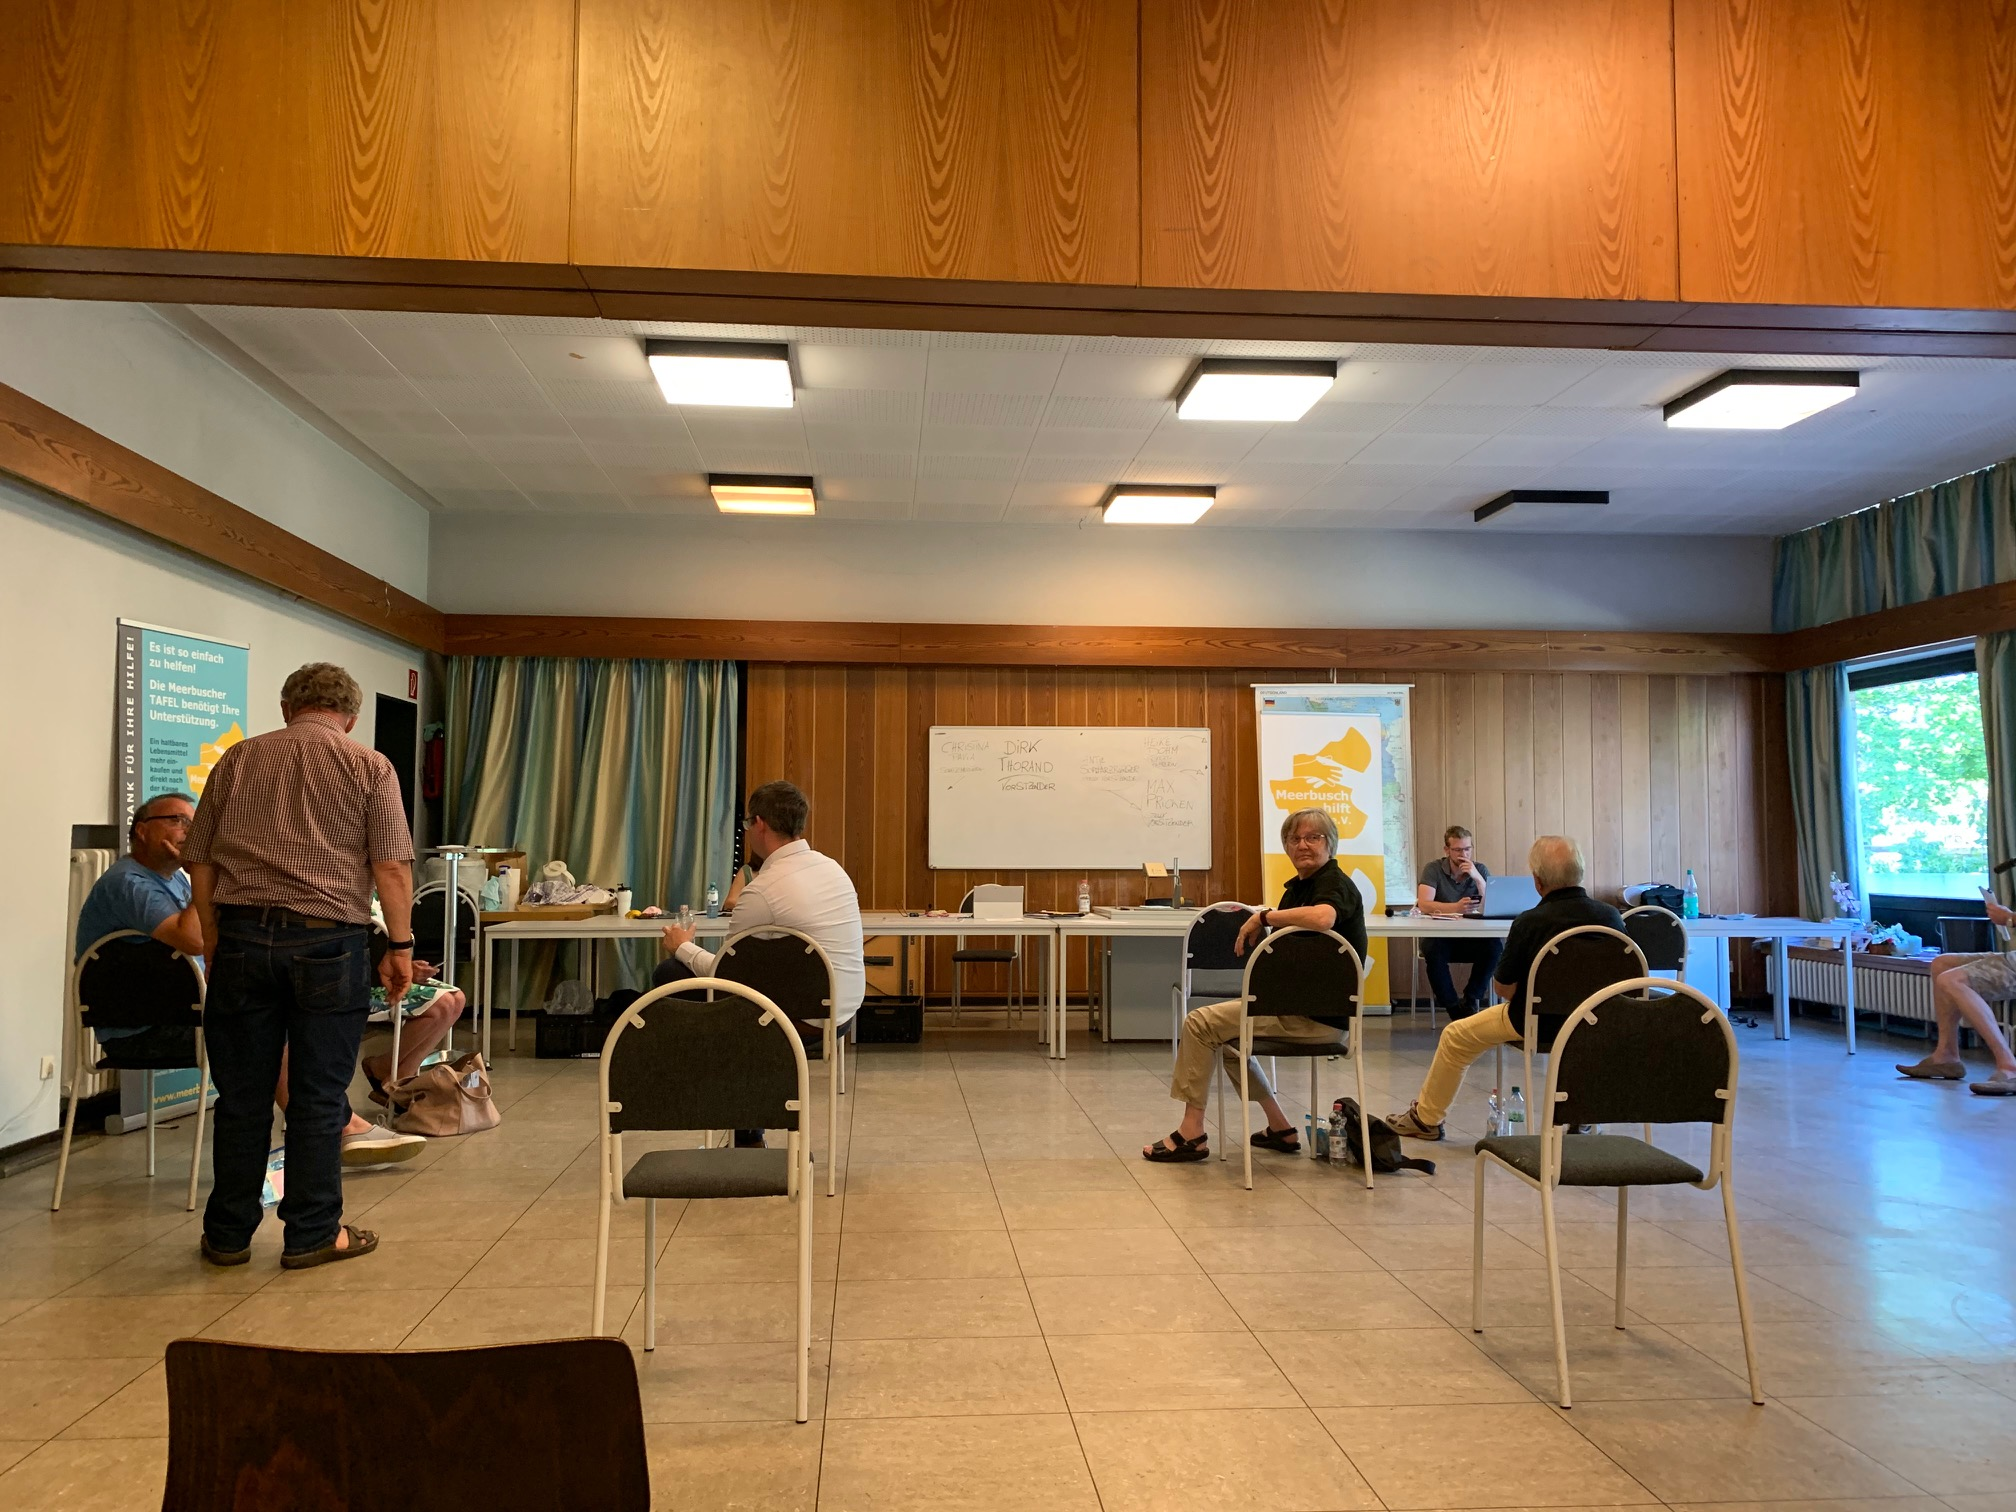 6. Mitgliederversammlung des Meerbusch Hilft e.V.